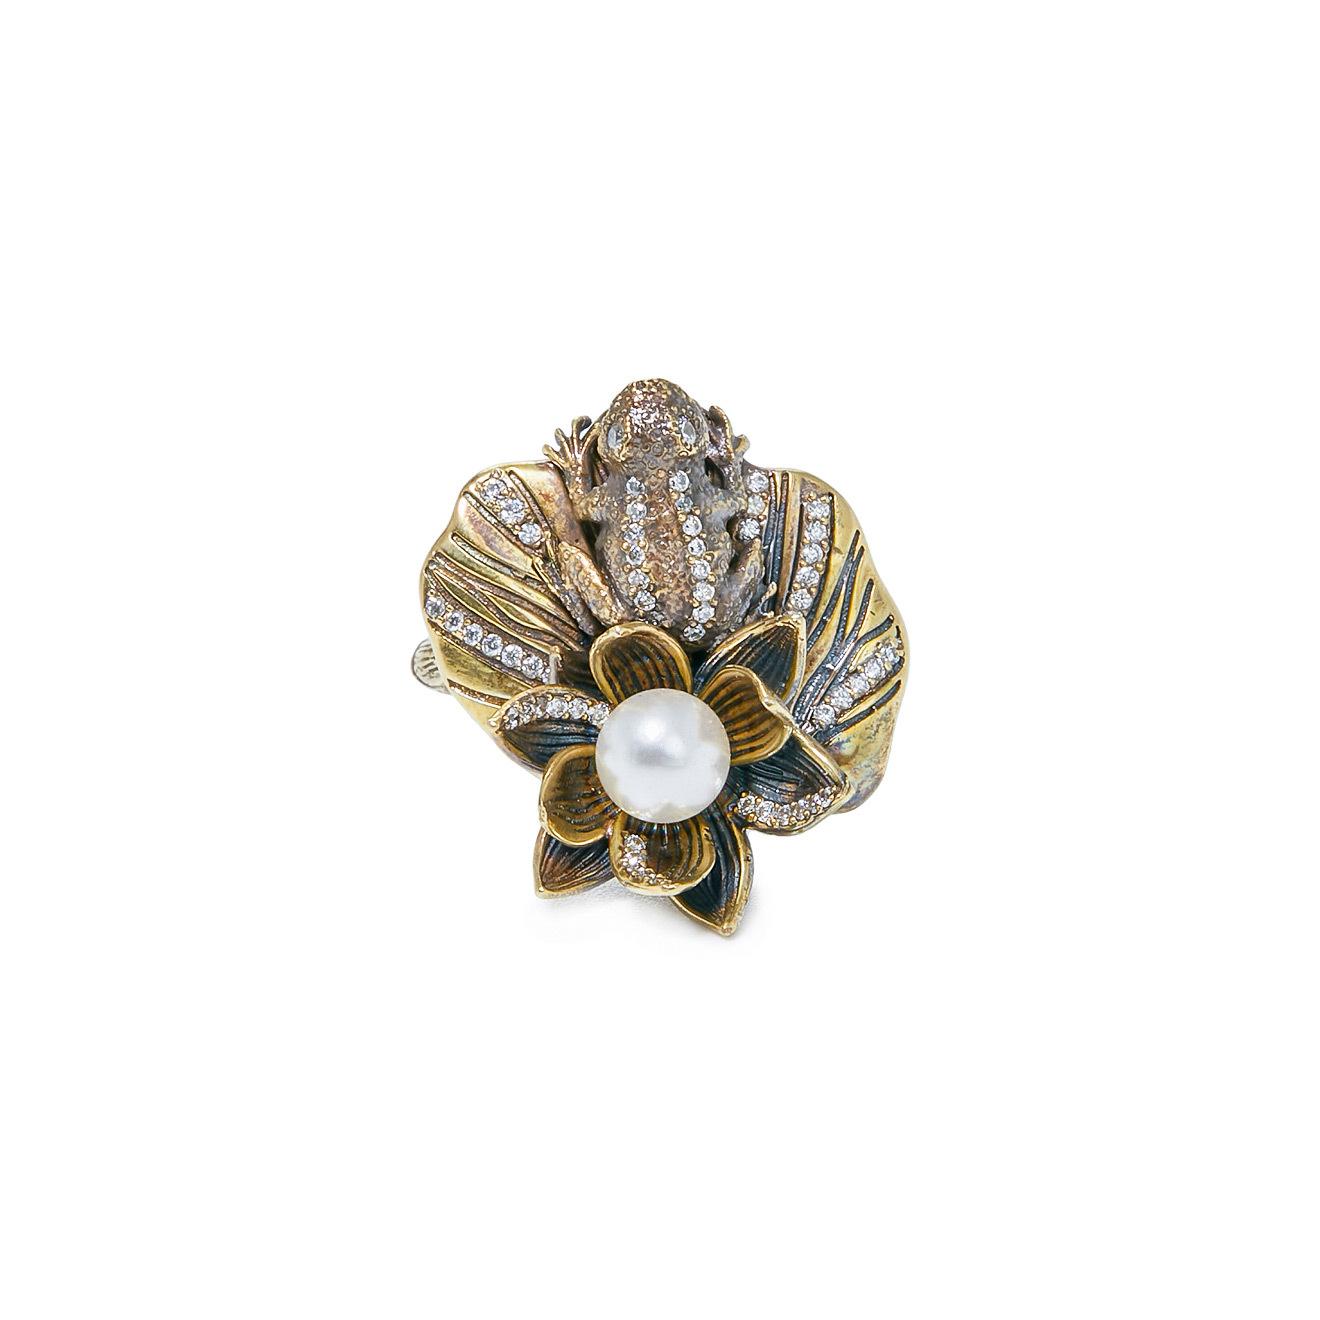 Fiore di Firenze Золотистое кольцо «Лягушка на лотосе» с жемчугом и кристаллами